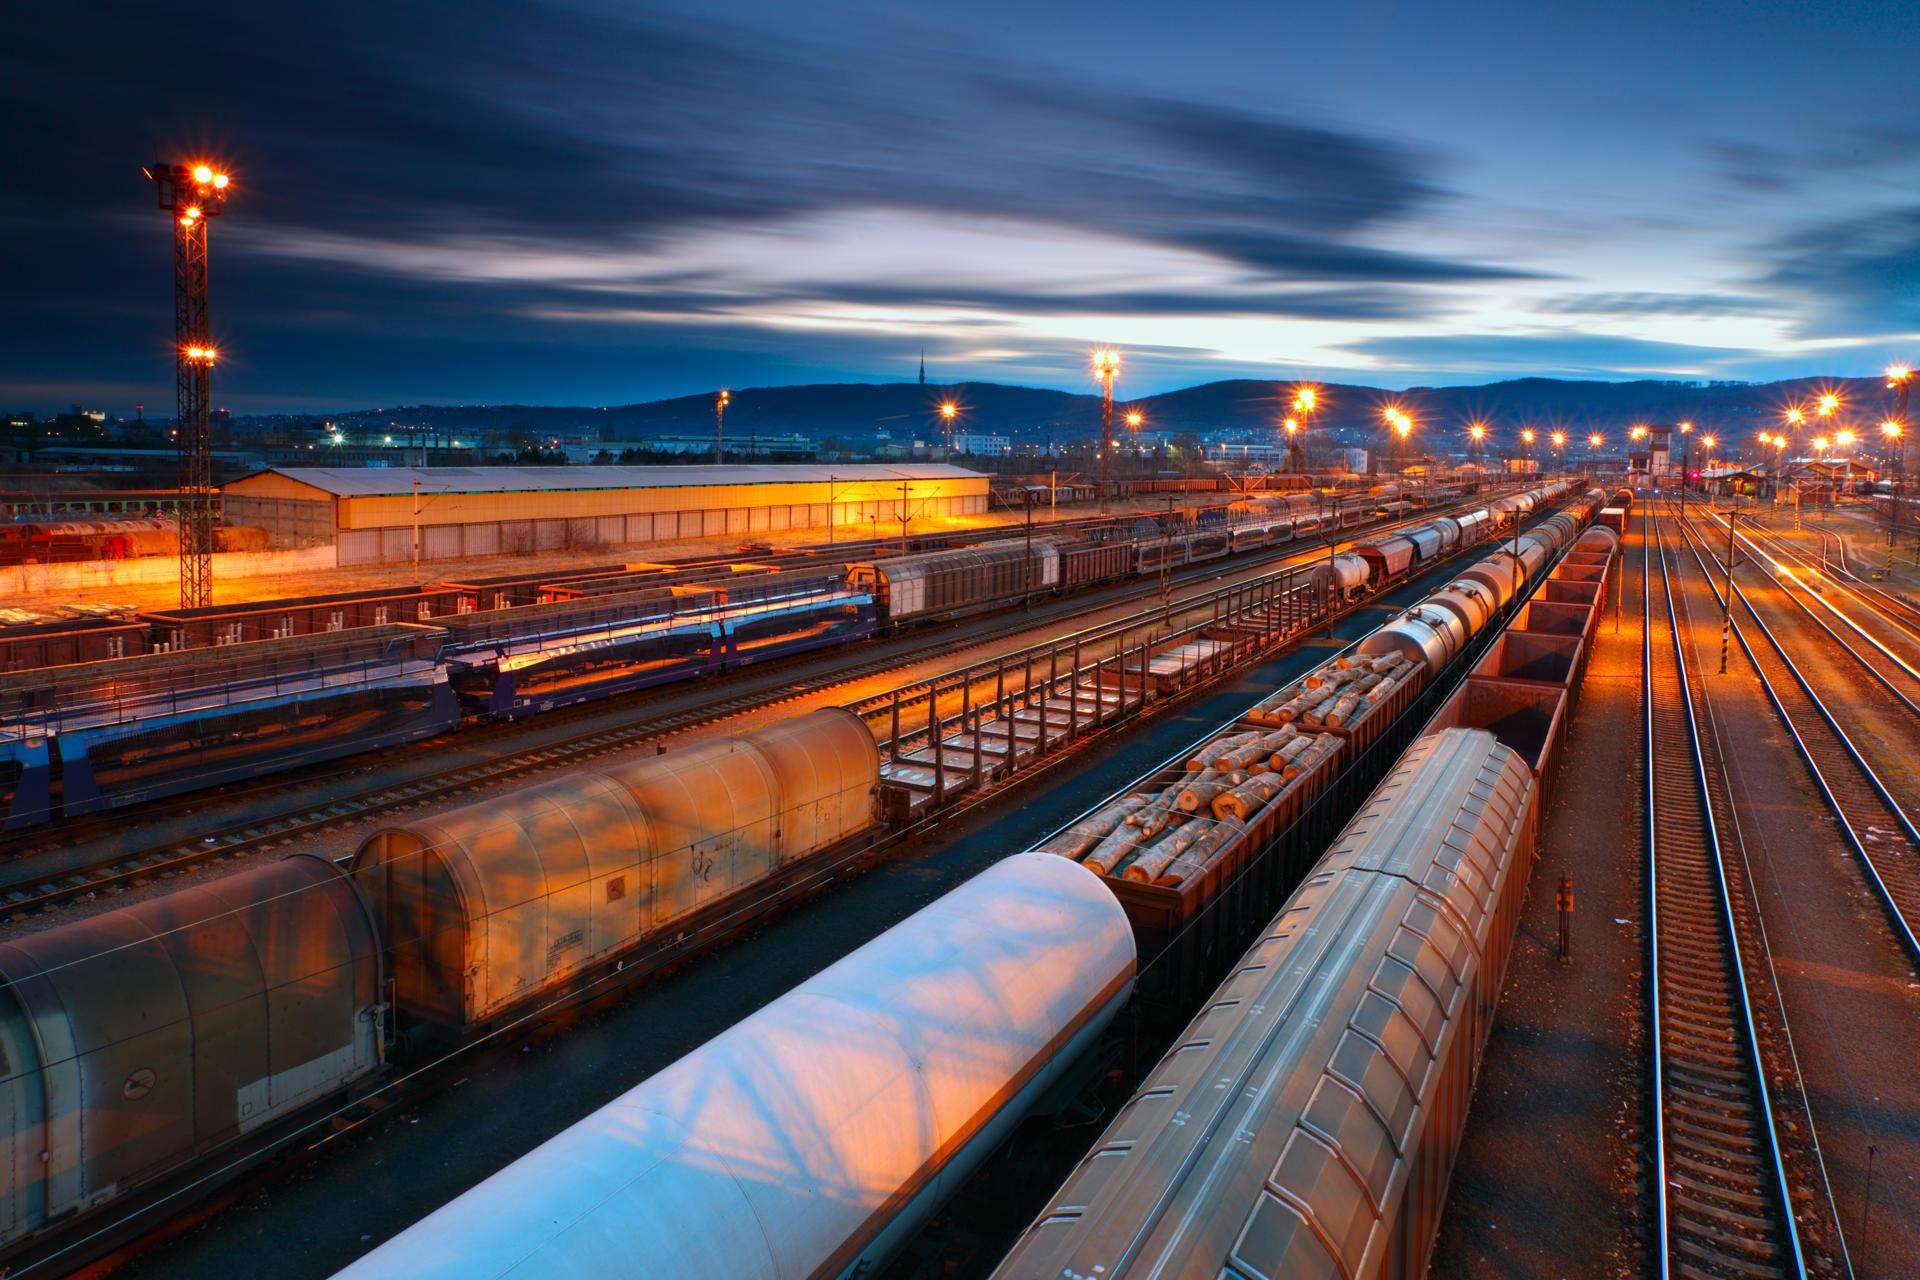 Rail Freight Long Distance /><div class='extra_thumbnails'><img class=